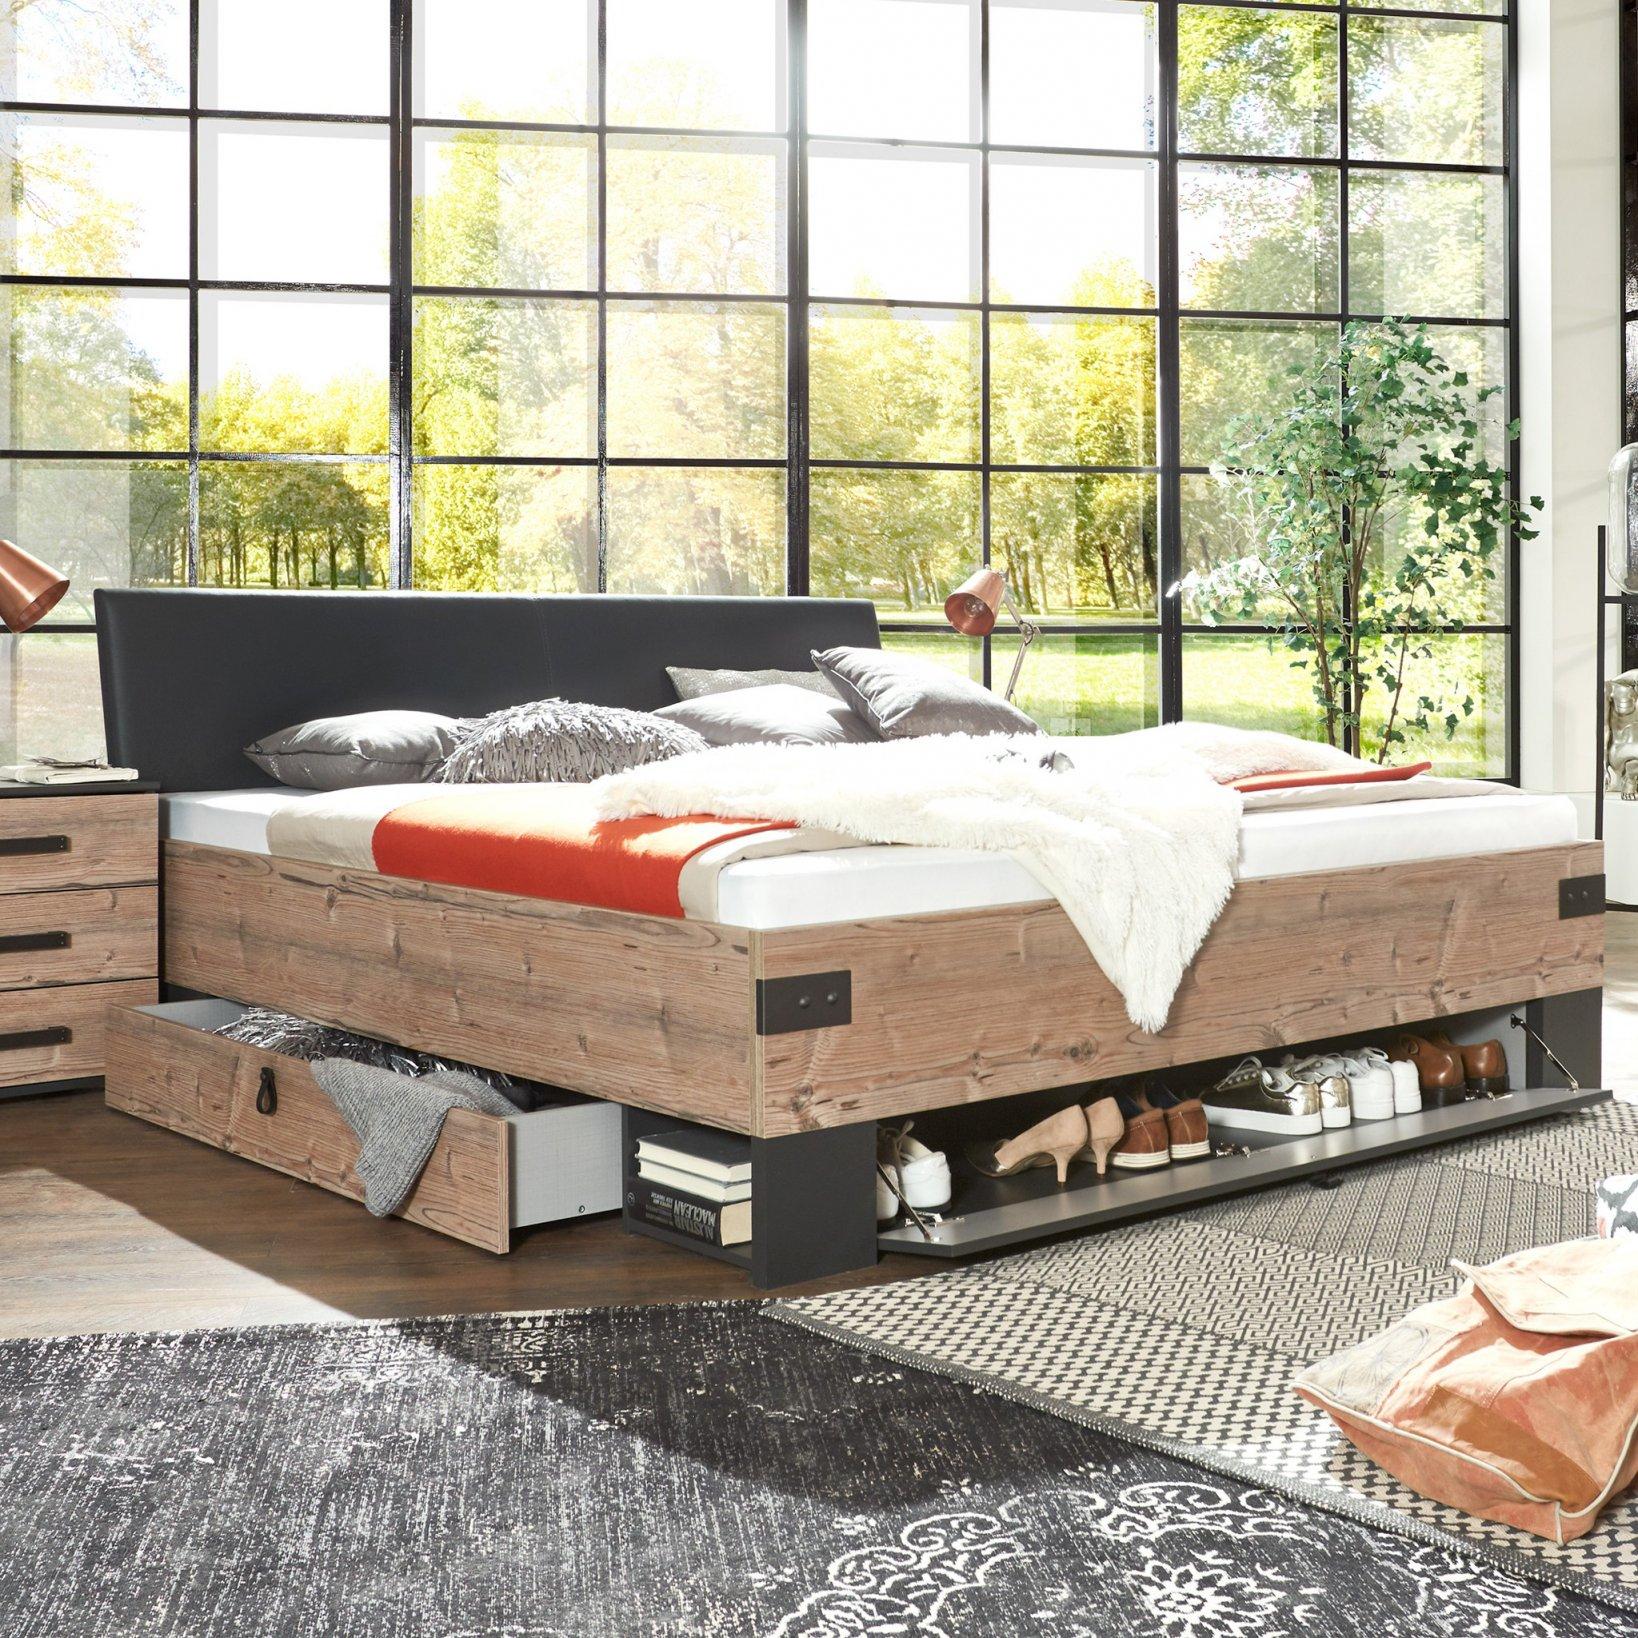 Bett Weiß 180X200 Massivholz Betten Steens 220 X 200 Topper von Bett 180X200 Massivholz Komforthöhe Bild